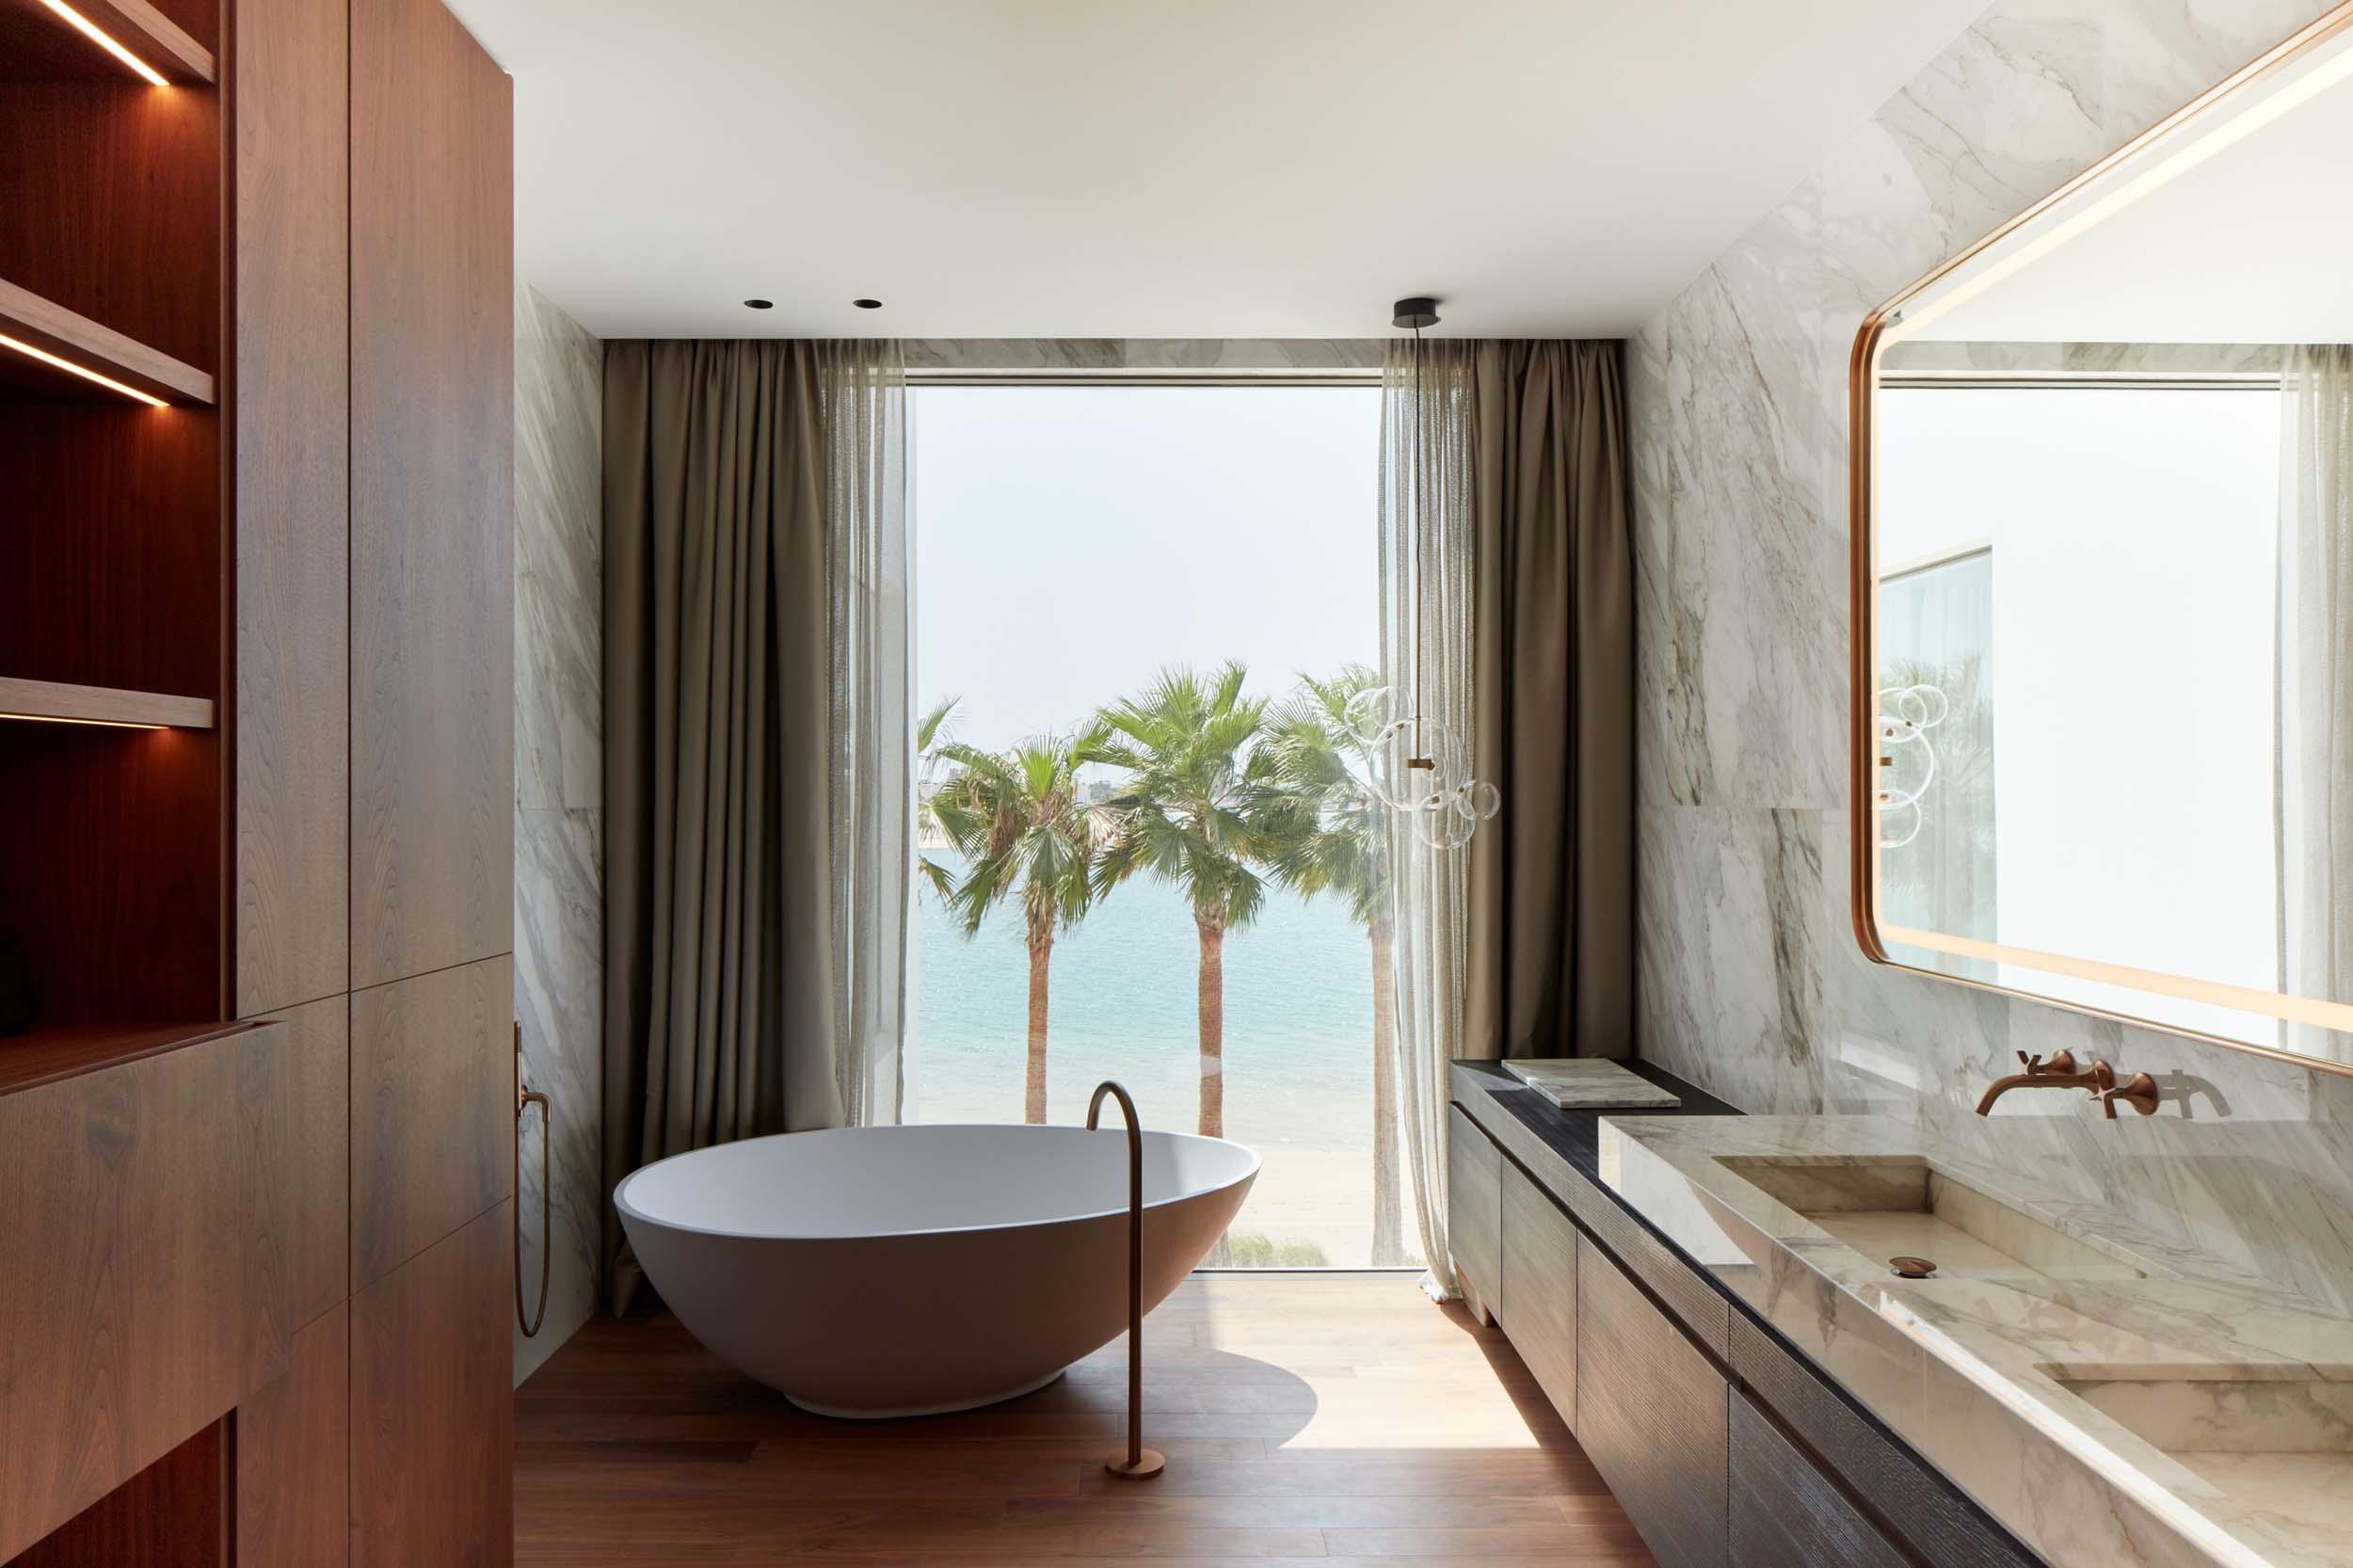 Bathrooms, Bathroom Renovation, Bathroom Refurbishment, Bathroom Furniture, Bathroom Vanity,